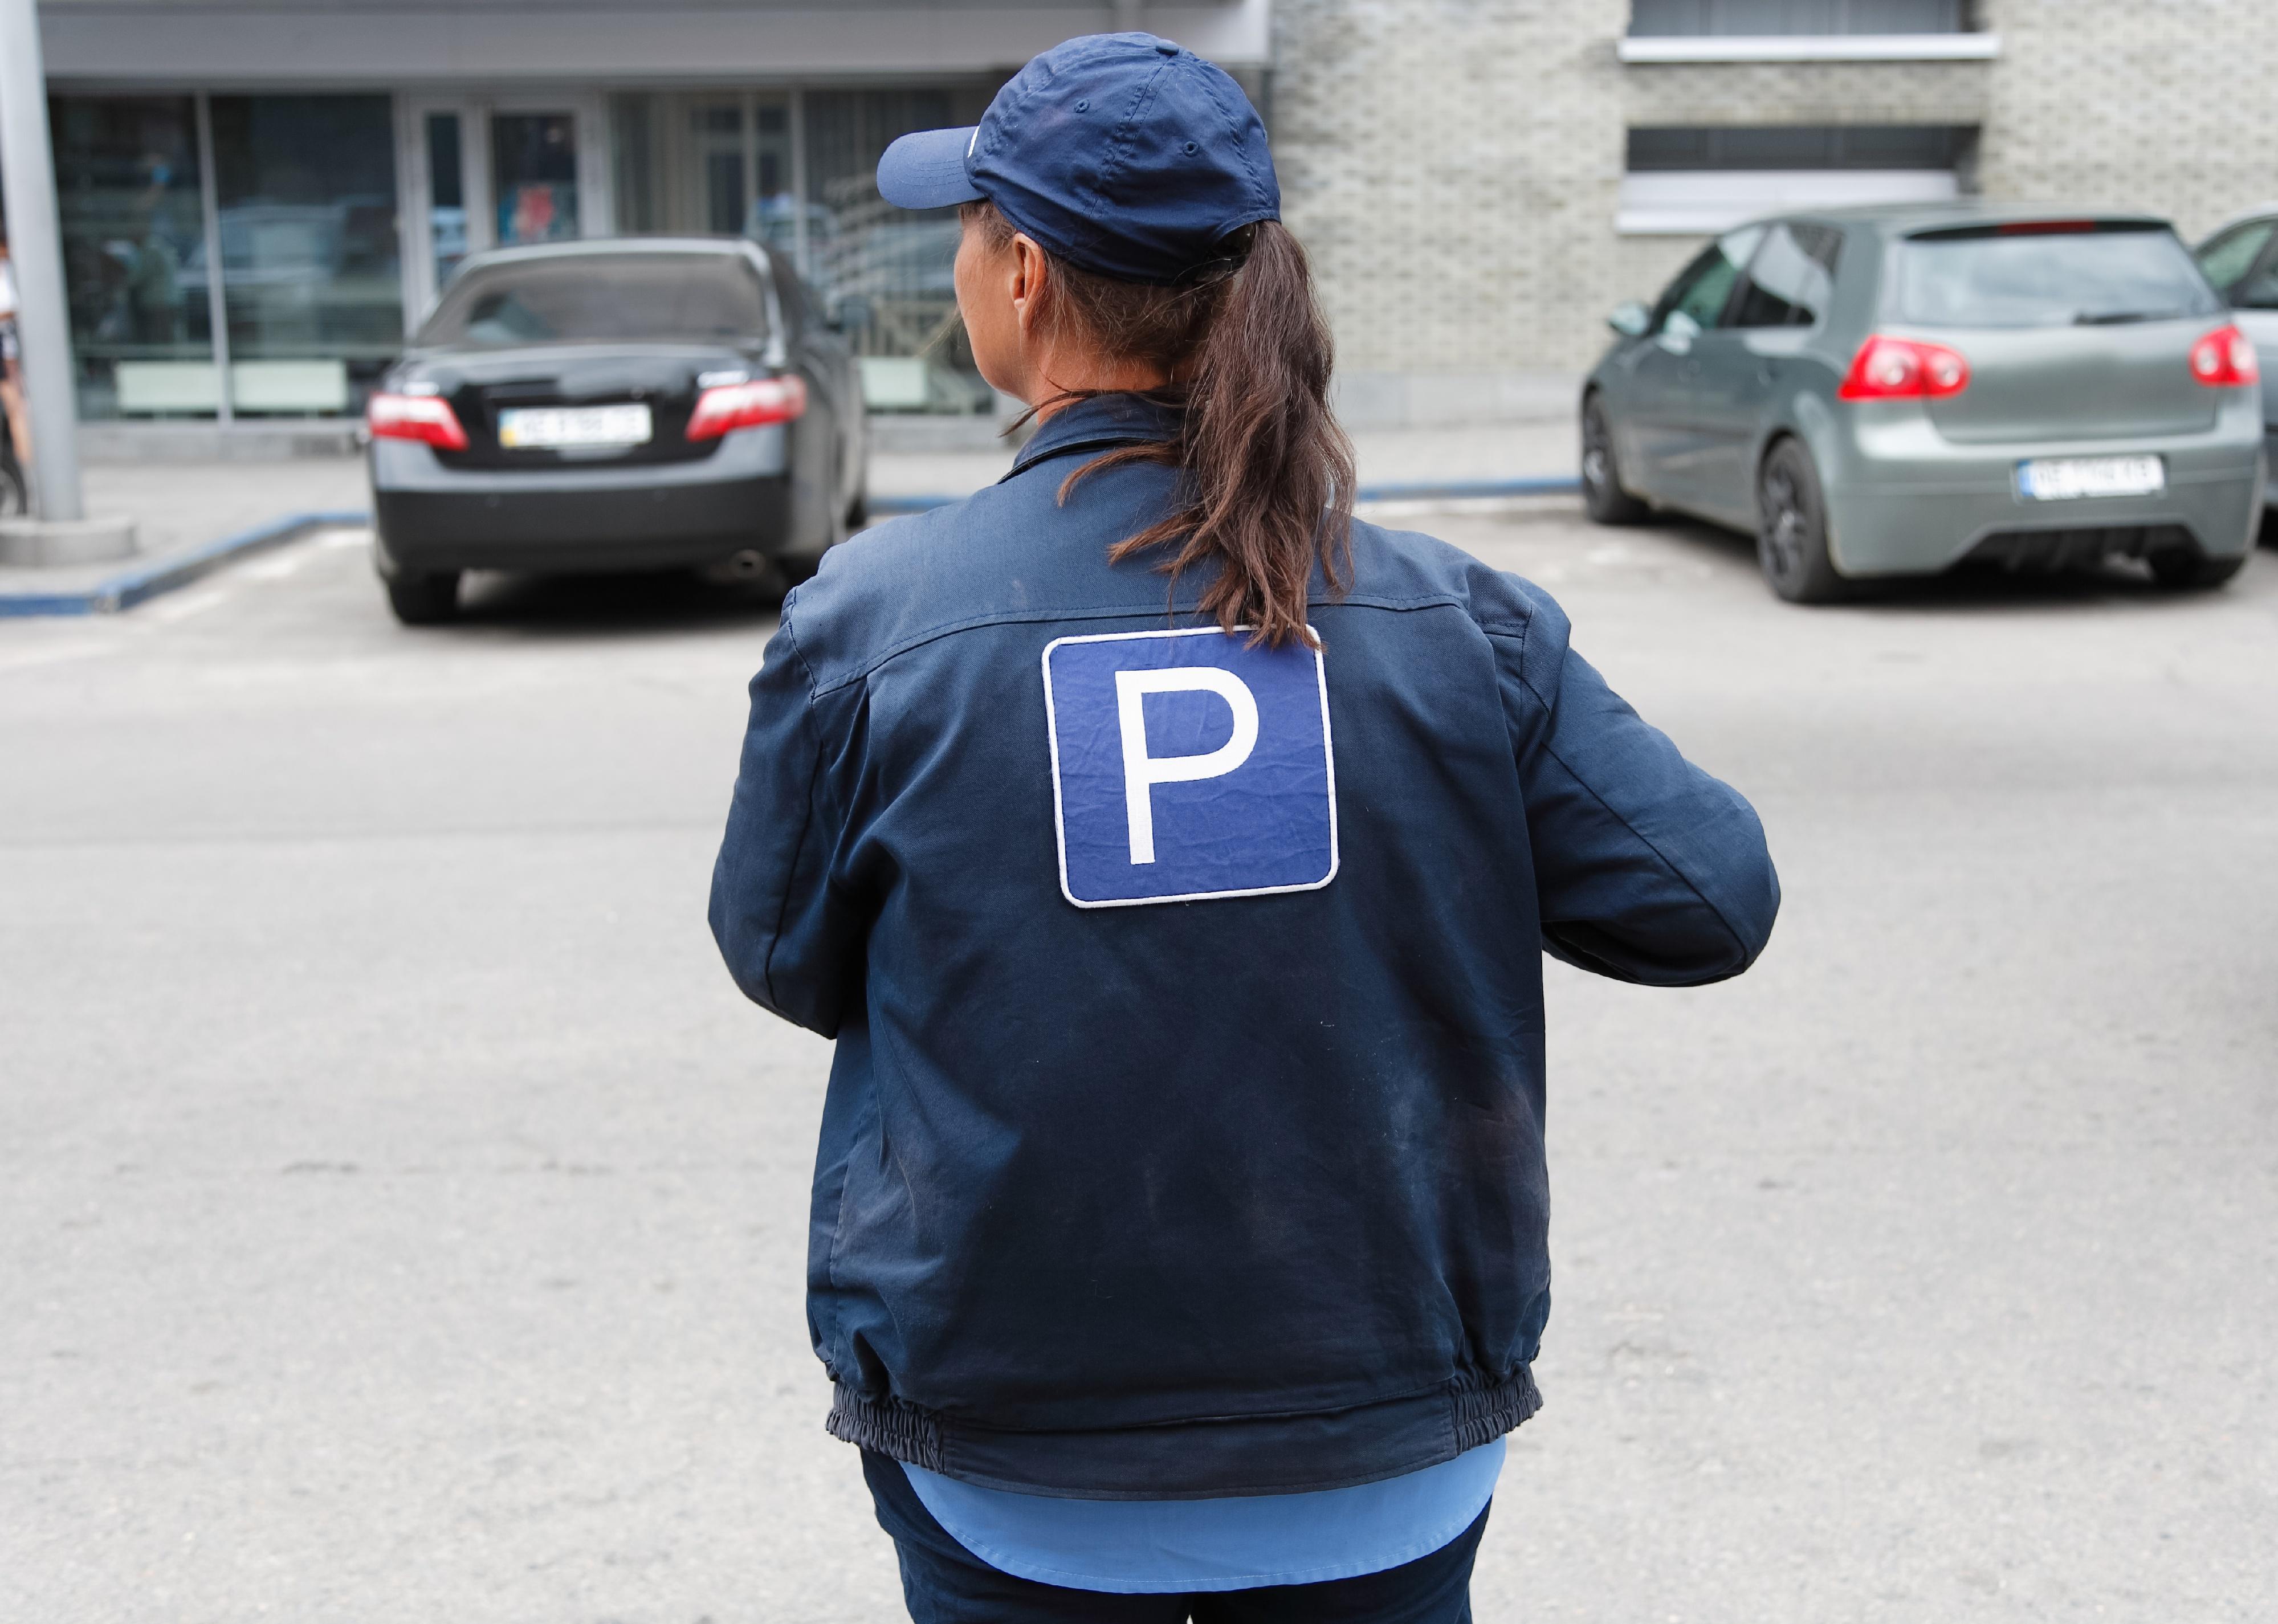 #75. Parking lot attendants